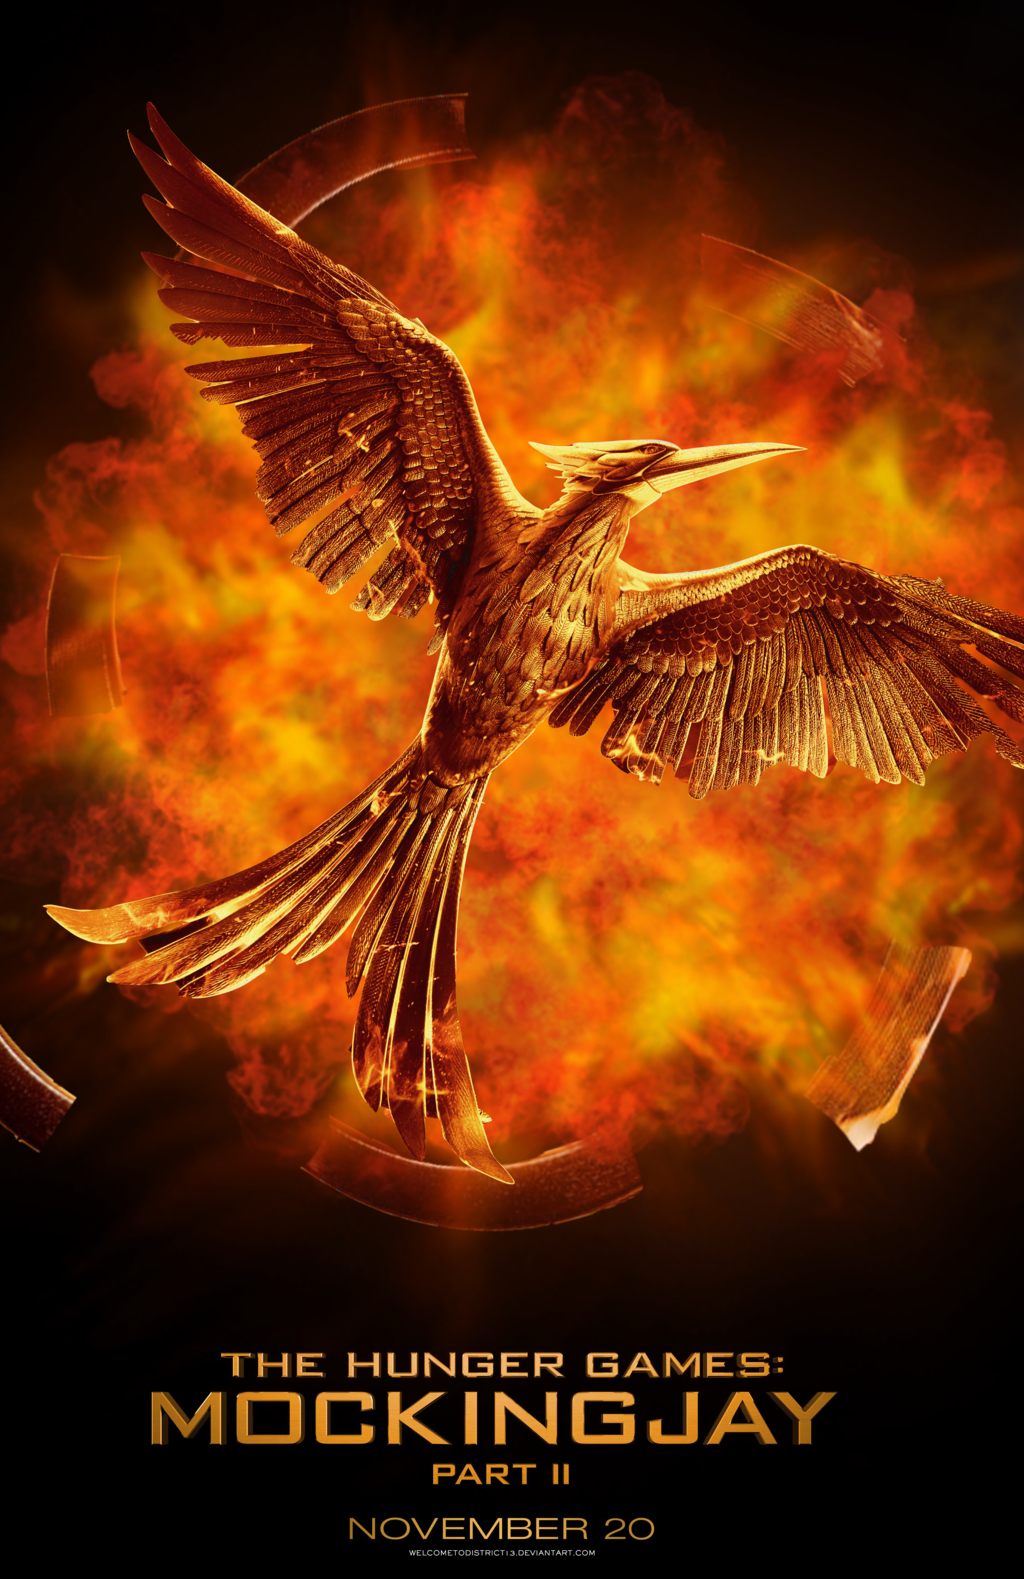 The Hunger Games 3 : Mockingjay Part 2 (2015) เกมล่าเกม: ม็อกกิ้งเจย์ พาร์ท 2 [HD]